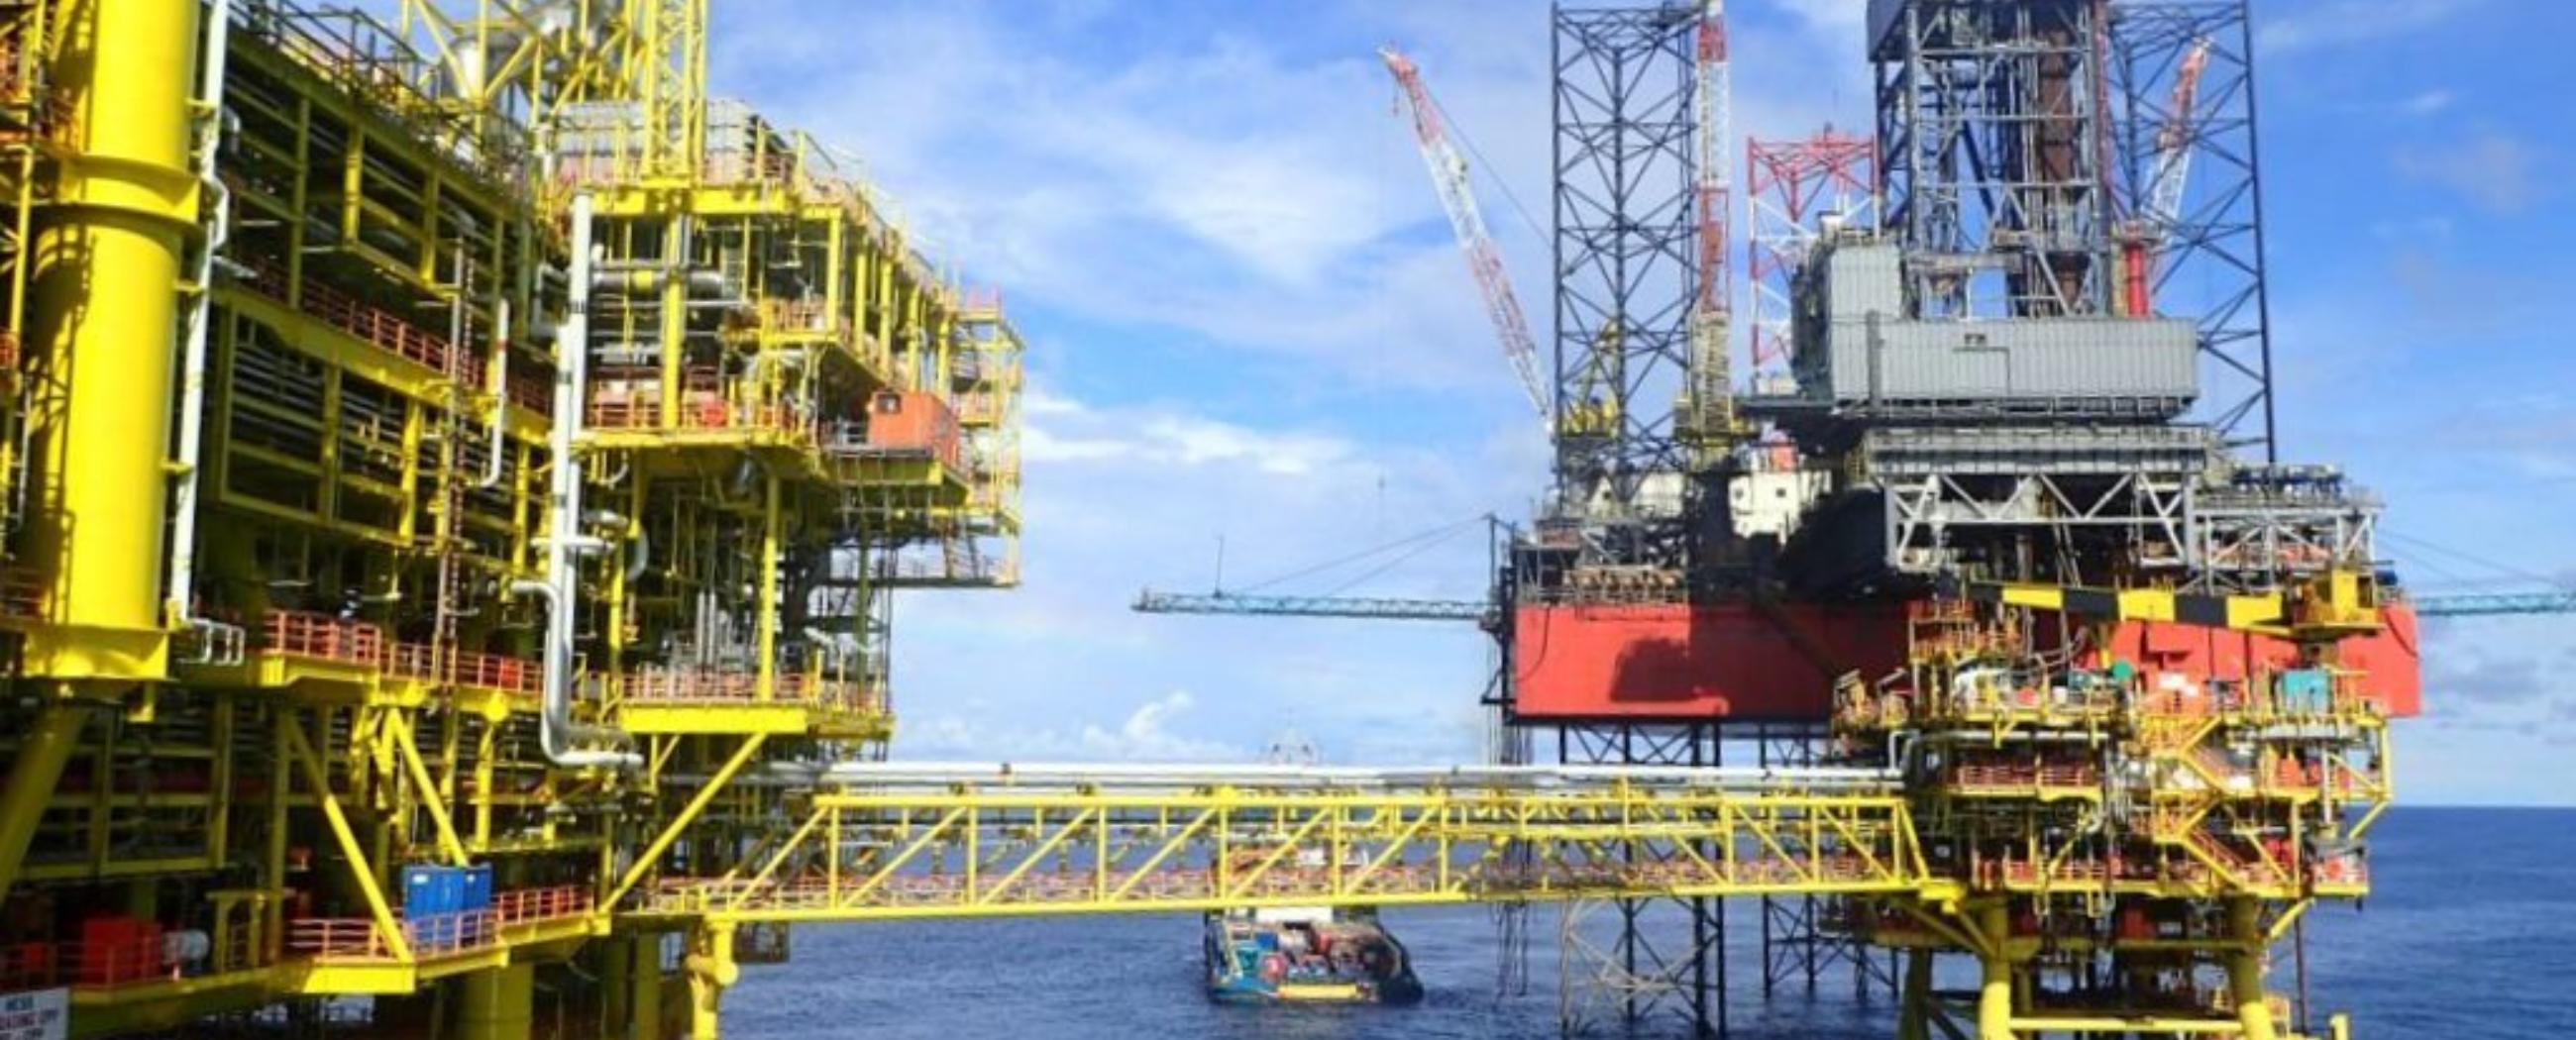 ALP Sweeper_HESS RUHM Anchor Tensioning mooring installation Gulf Valour FPSO.jpeg